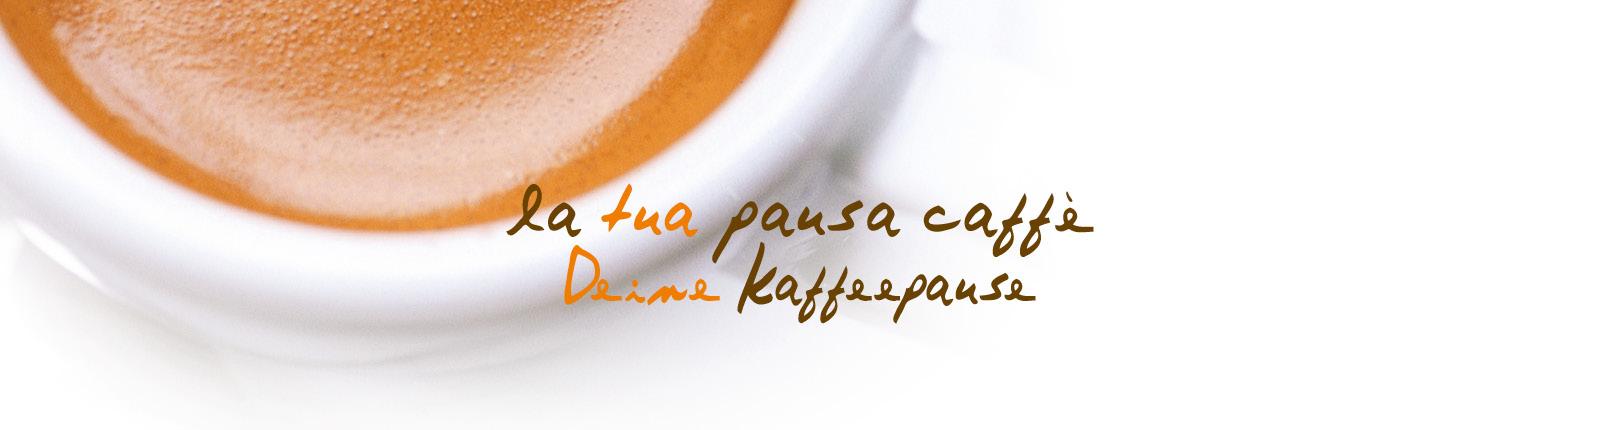 automatic-service-pausa-caffe-koffee-pause